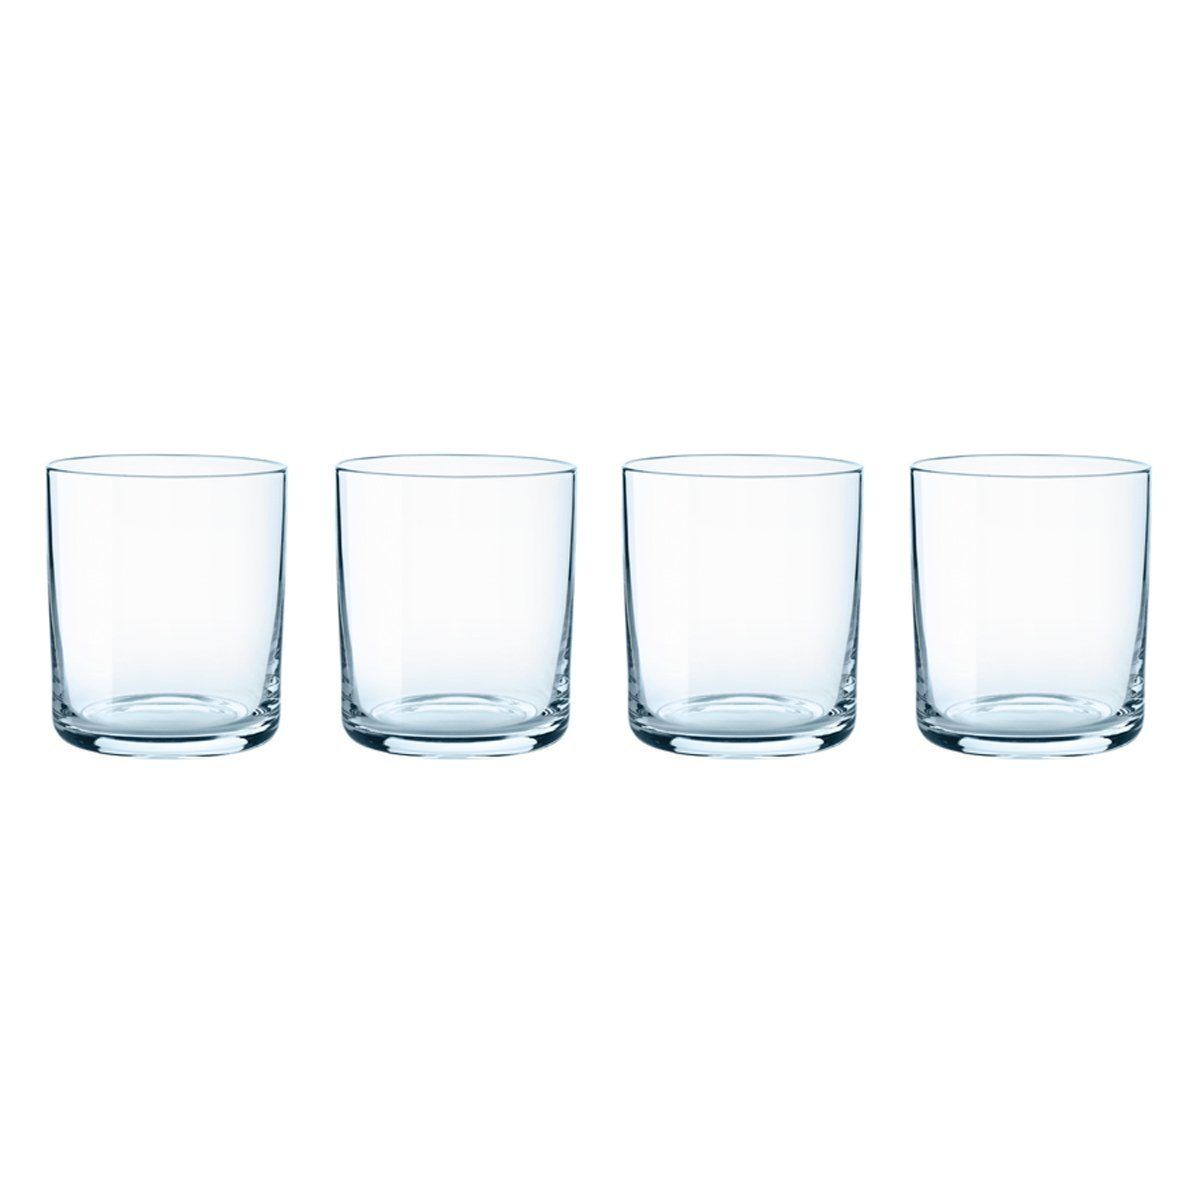 Stelton Stelton Gläser SIMPLY blau - 4-er Set 0.3 l